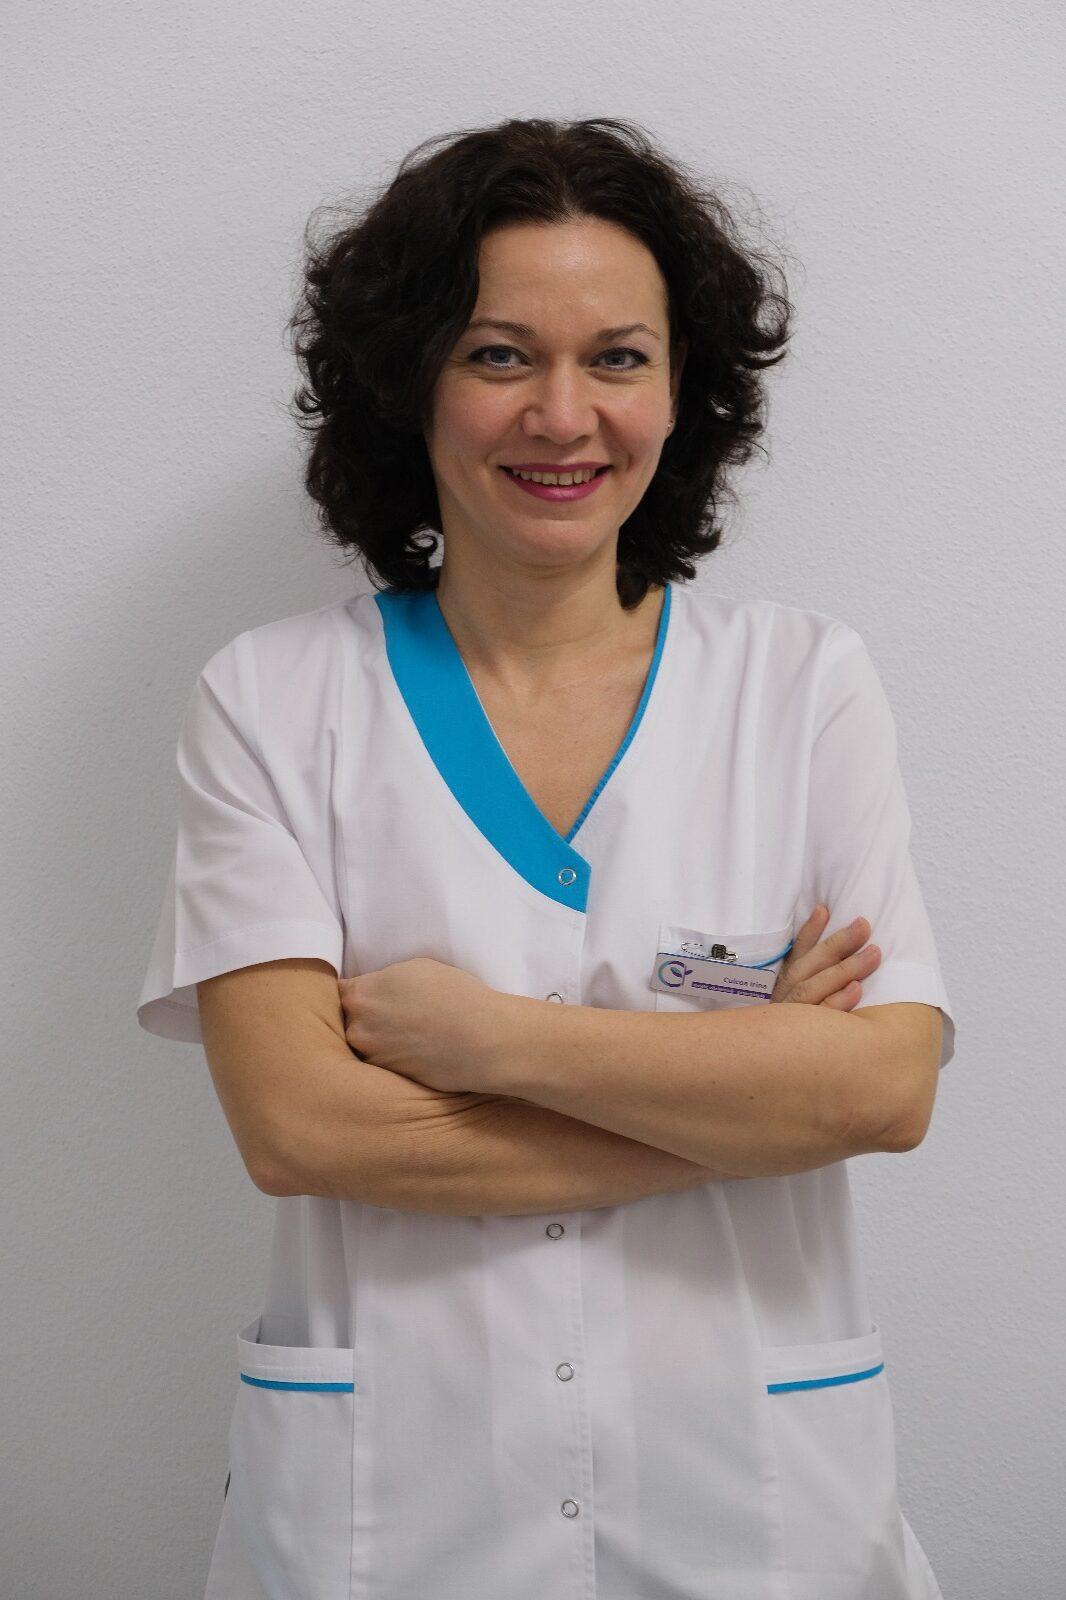 Dr. Culcea Irina 01 rotated